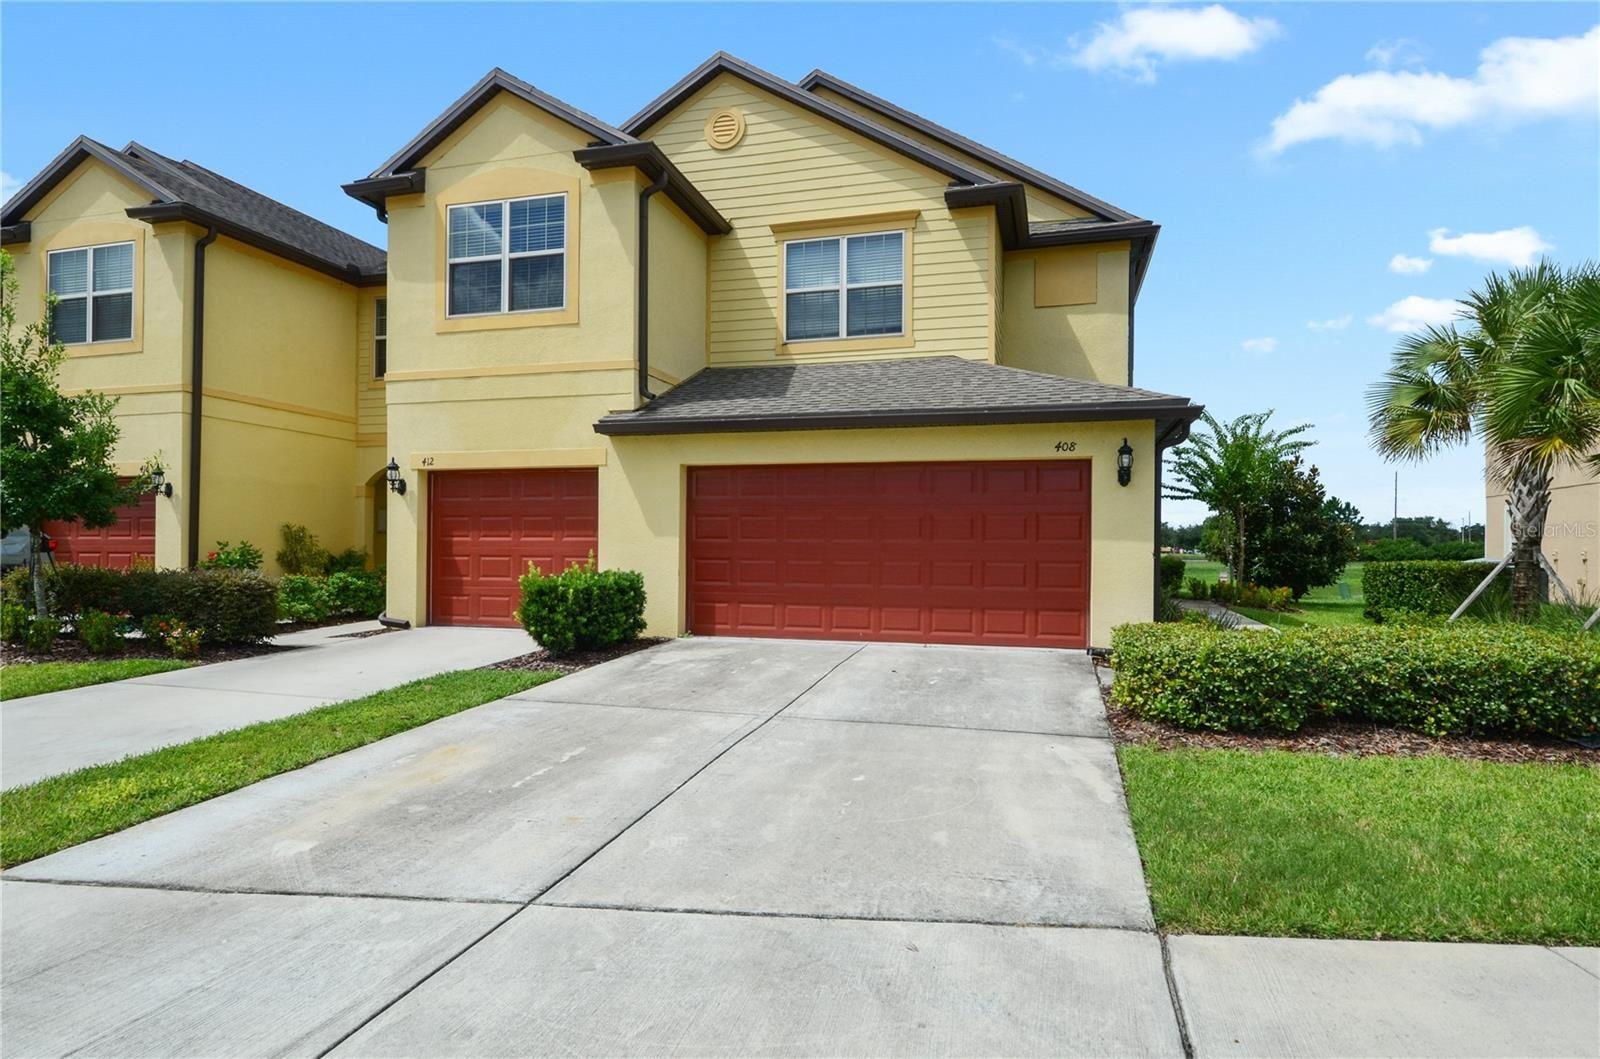 408 ARTISAN STREET, Orlando, FL 32824 - #: O5965840